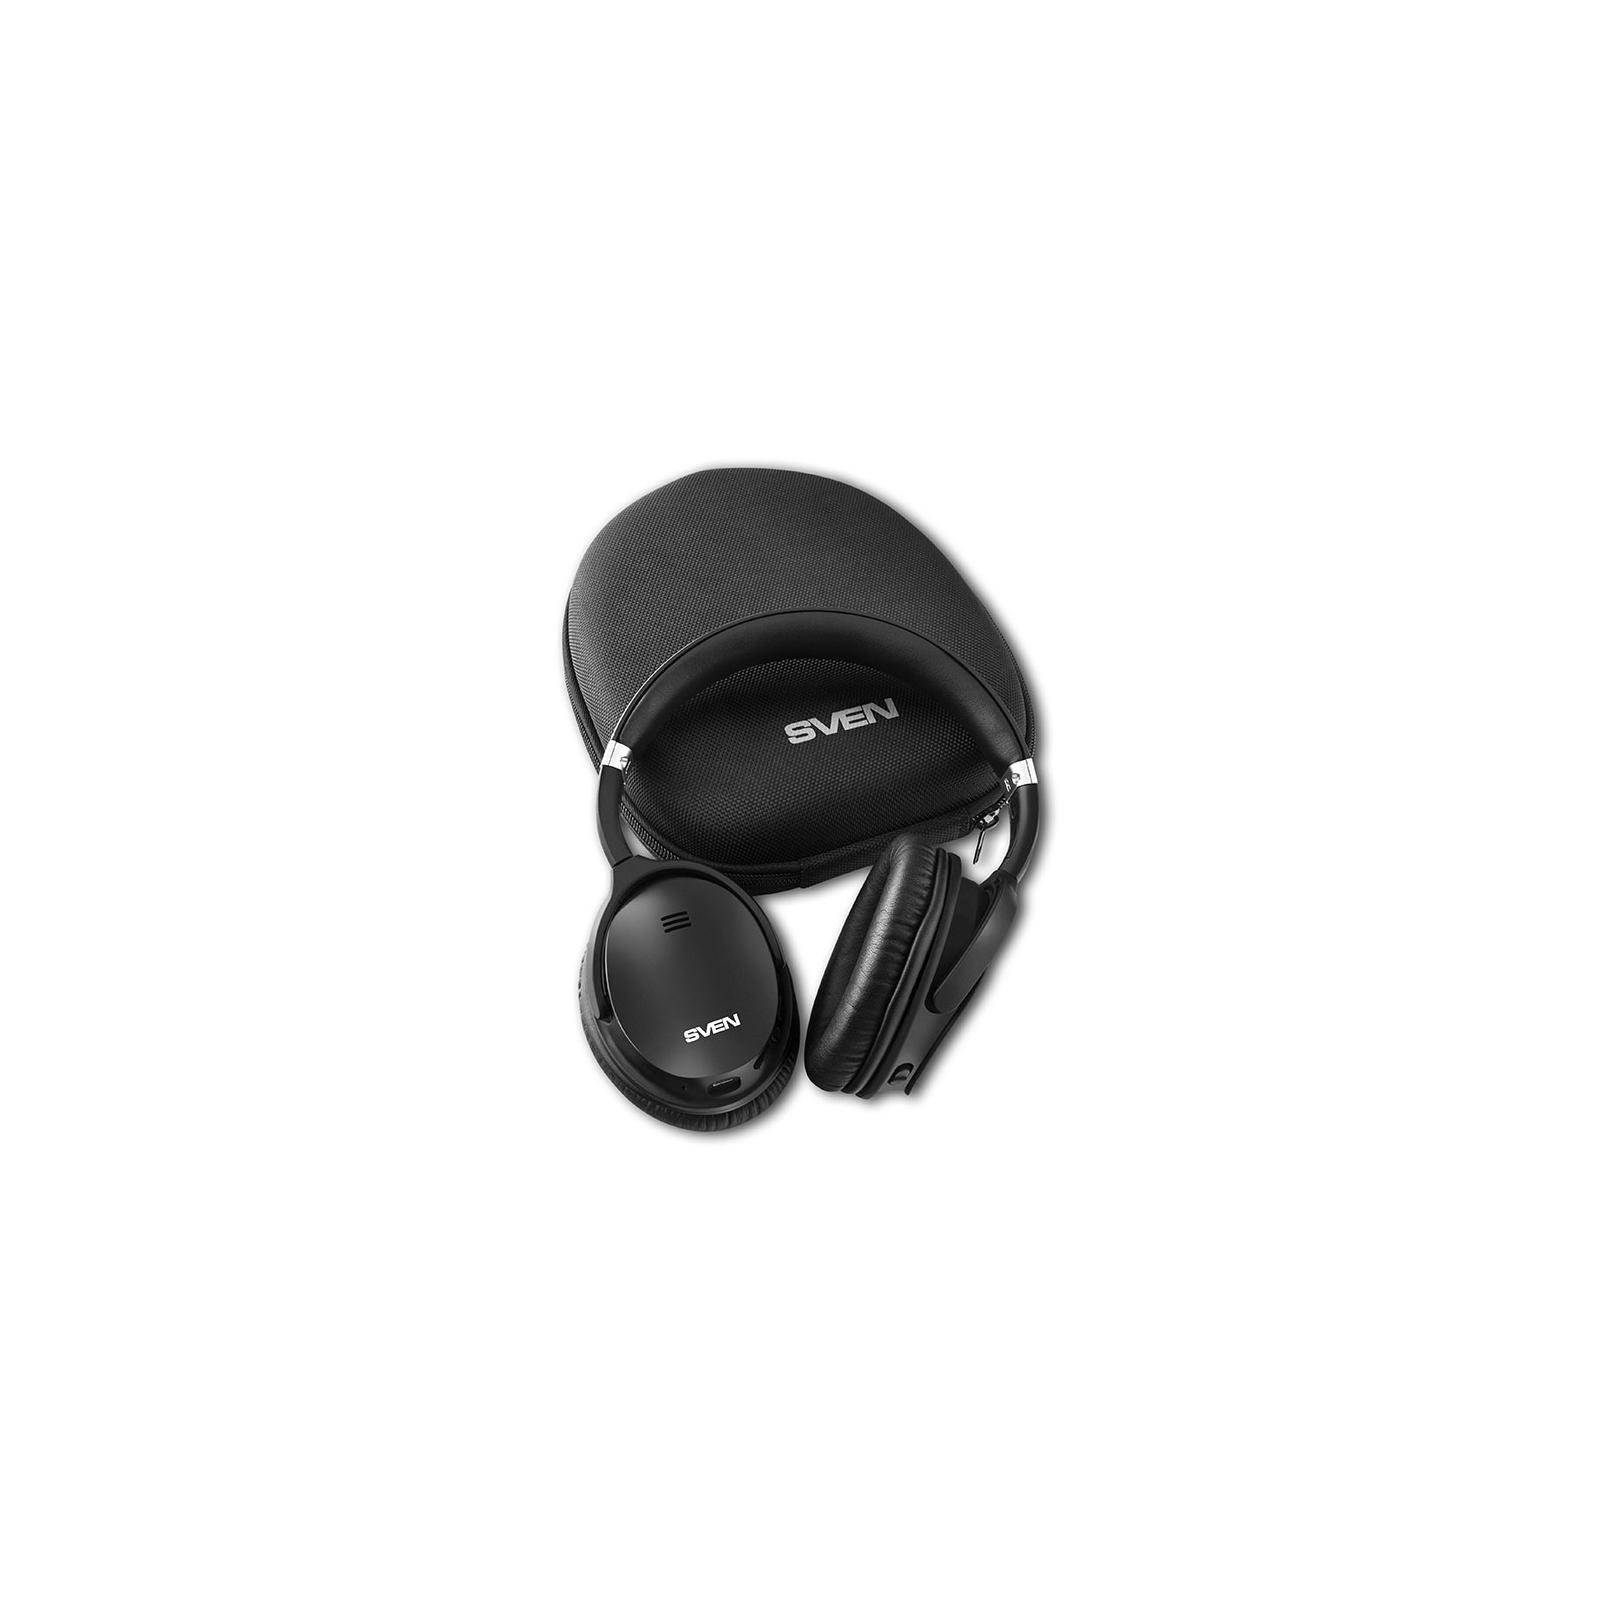 Наушники Sven AP-B900MV Black Bluetooth (AP-B900MV black) изображение 7